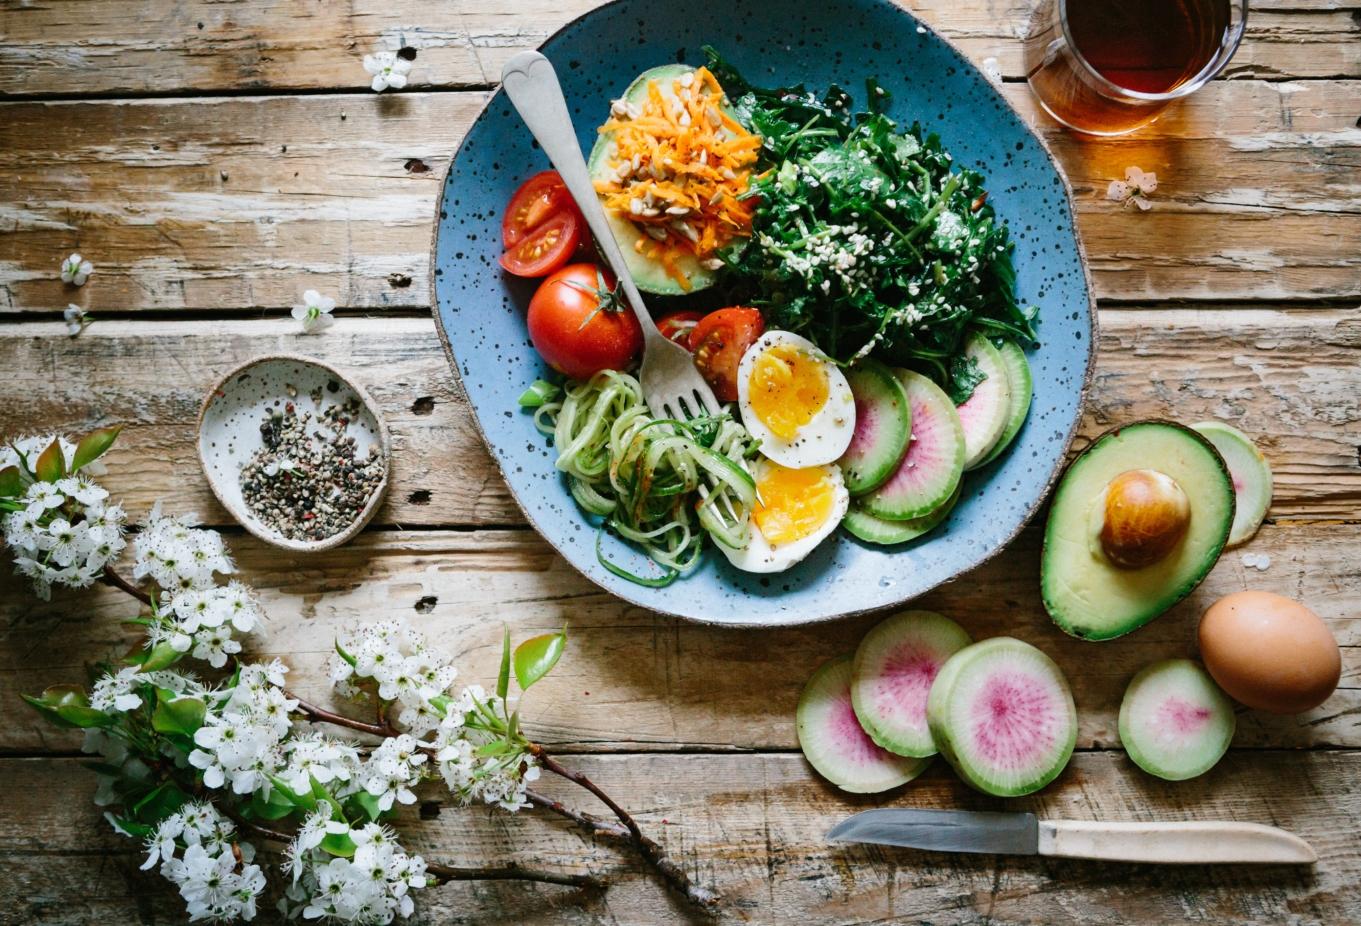 Olvídate de dietas para adelgazar 2